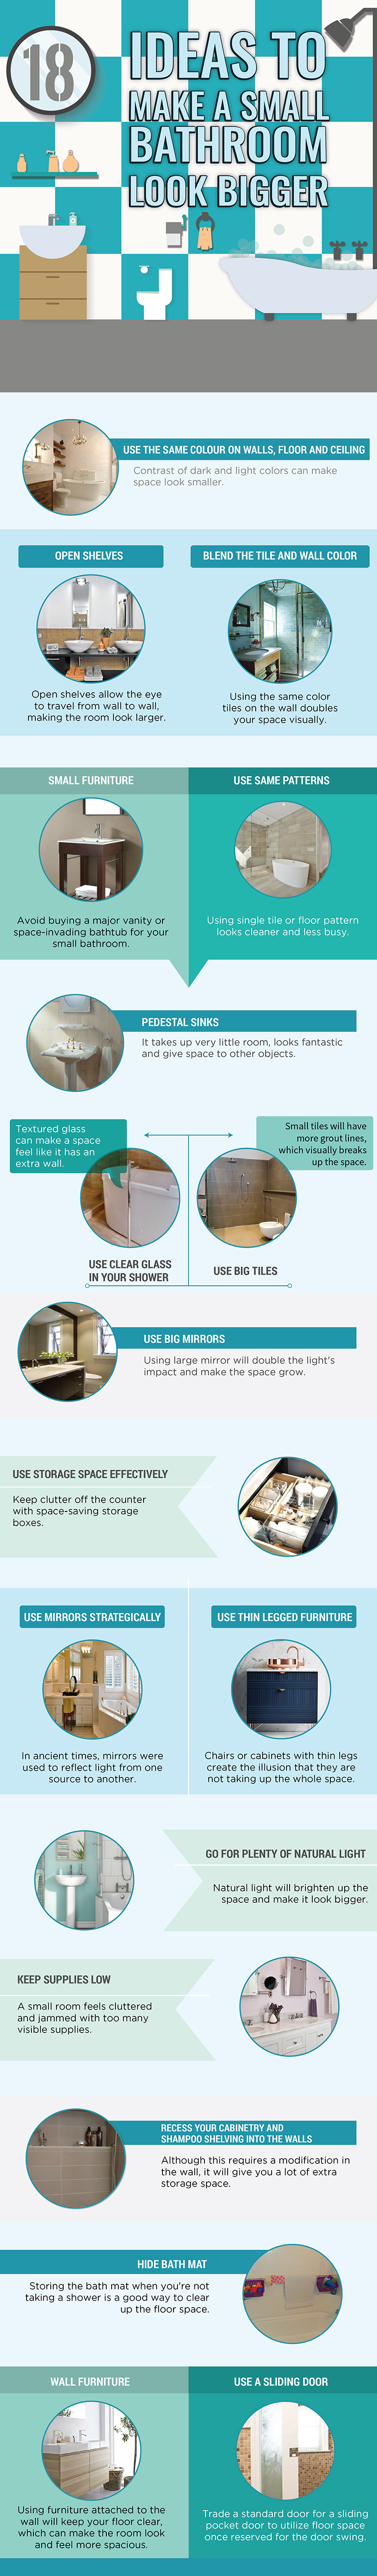 Small Bathroom Ideas To Make It Look Bigger 18 (of the best) ideas to make a small bathroom look bigger - 4 pumps